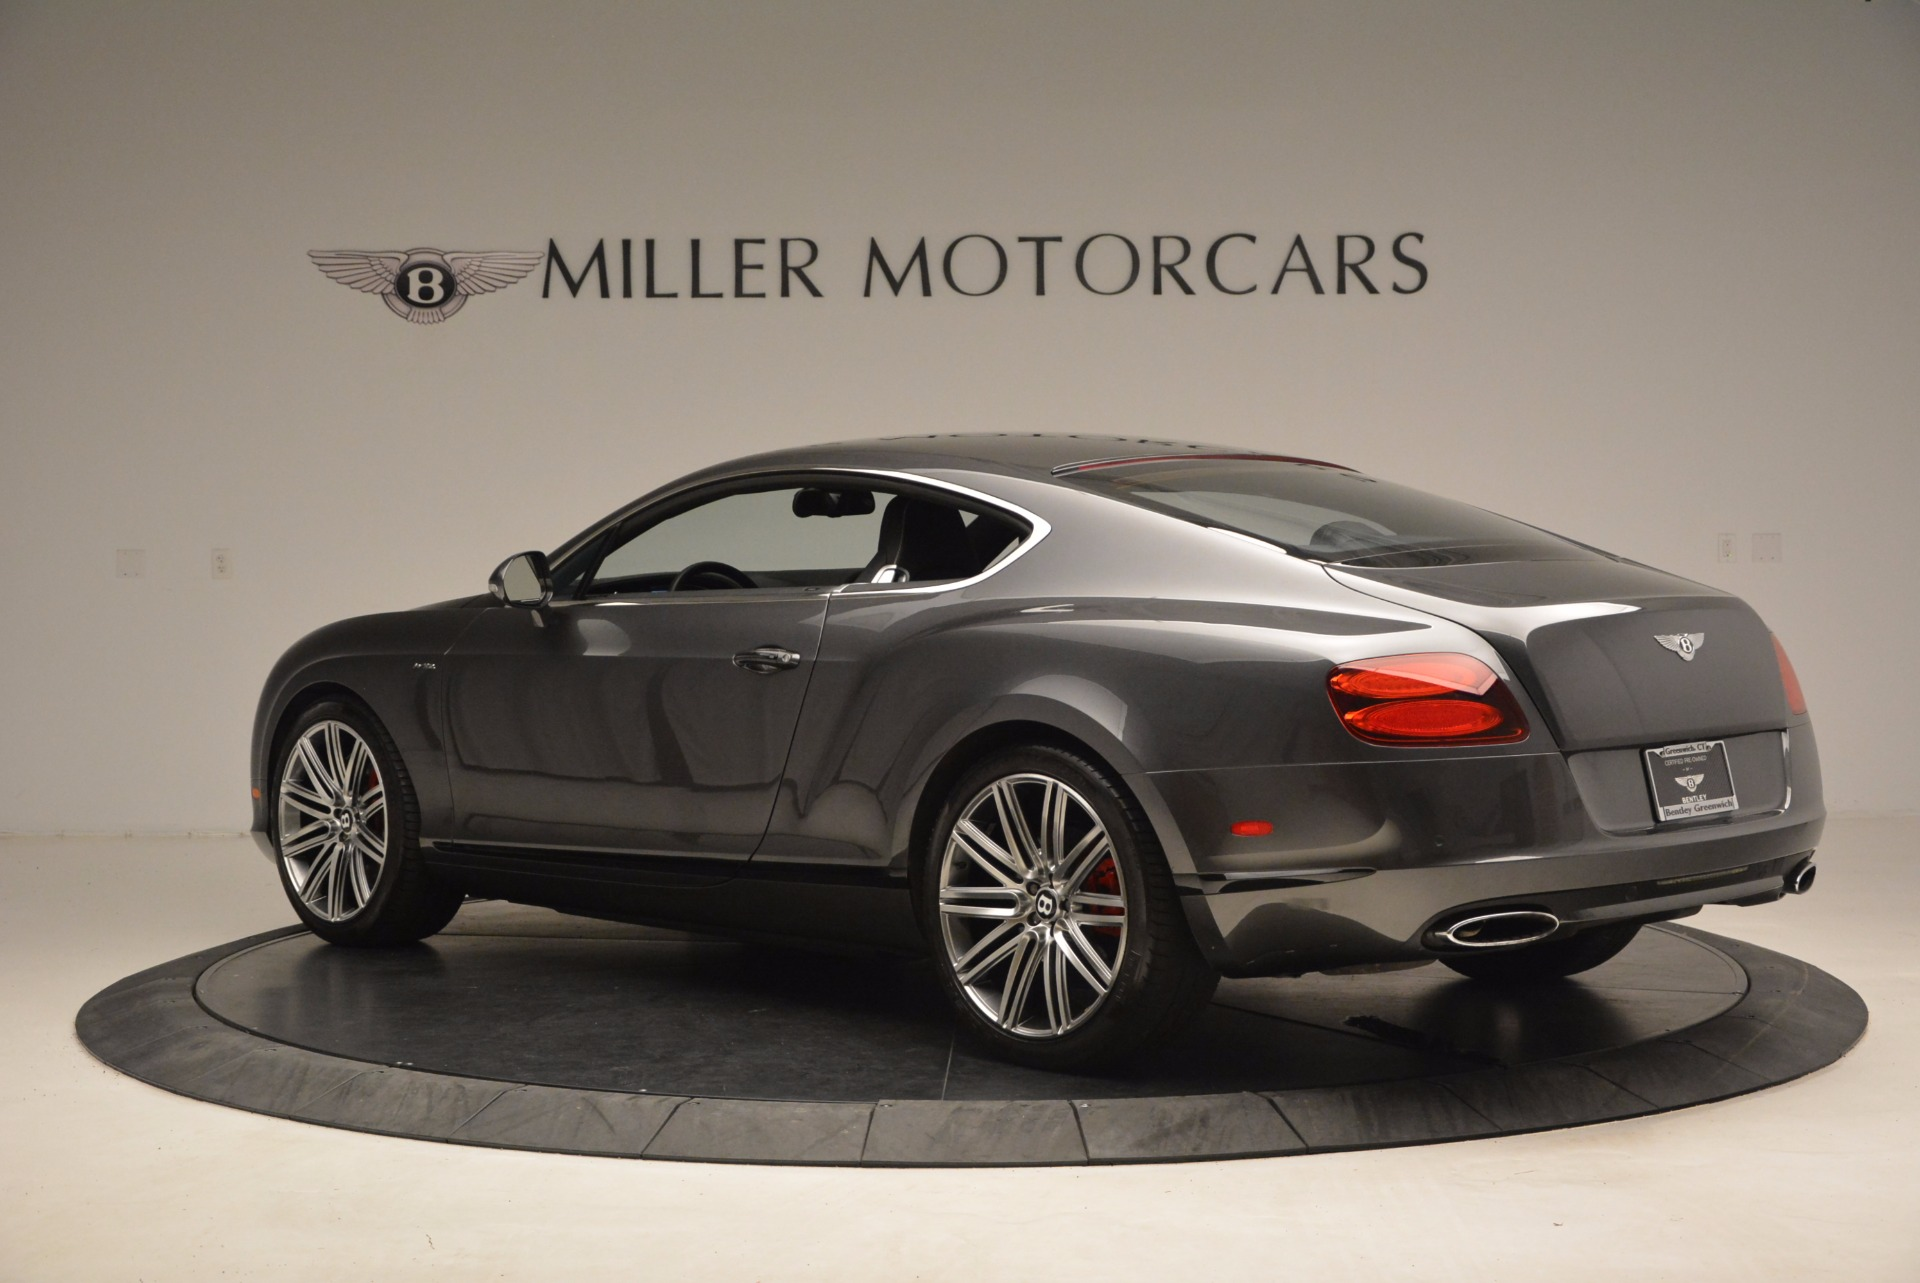 Used 2014 Bentley Continental GT Speed For Sale In Westport, CT 1473_p4